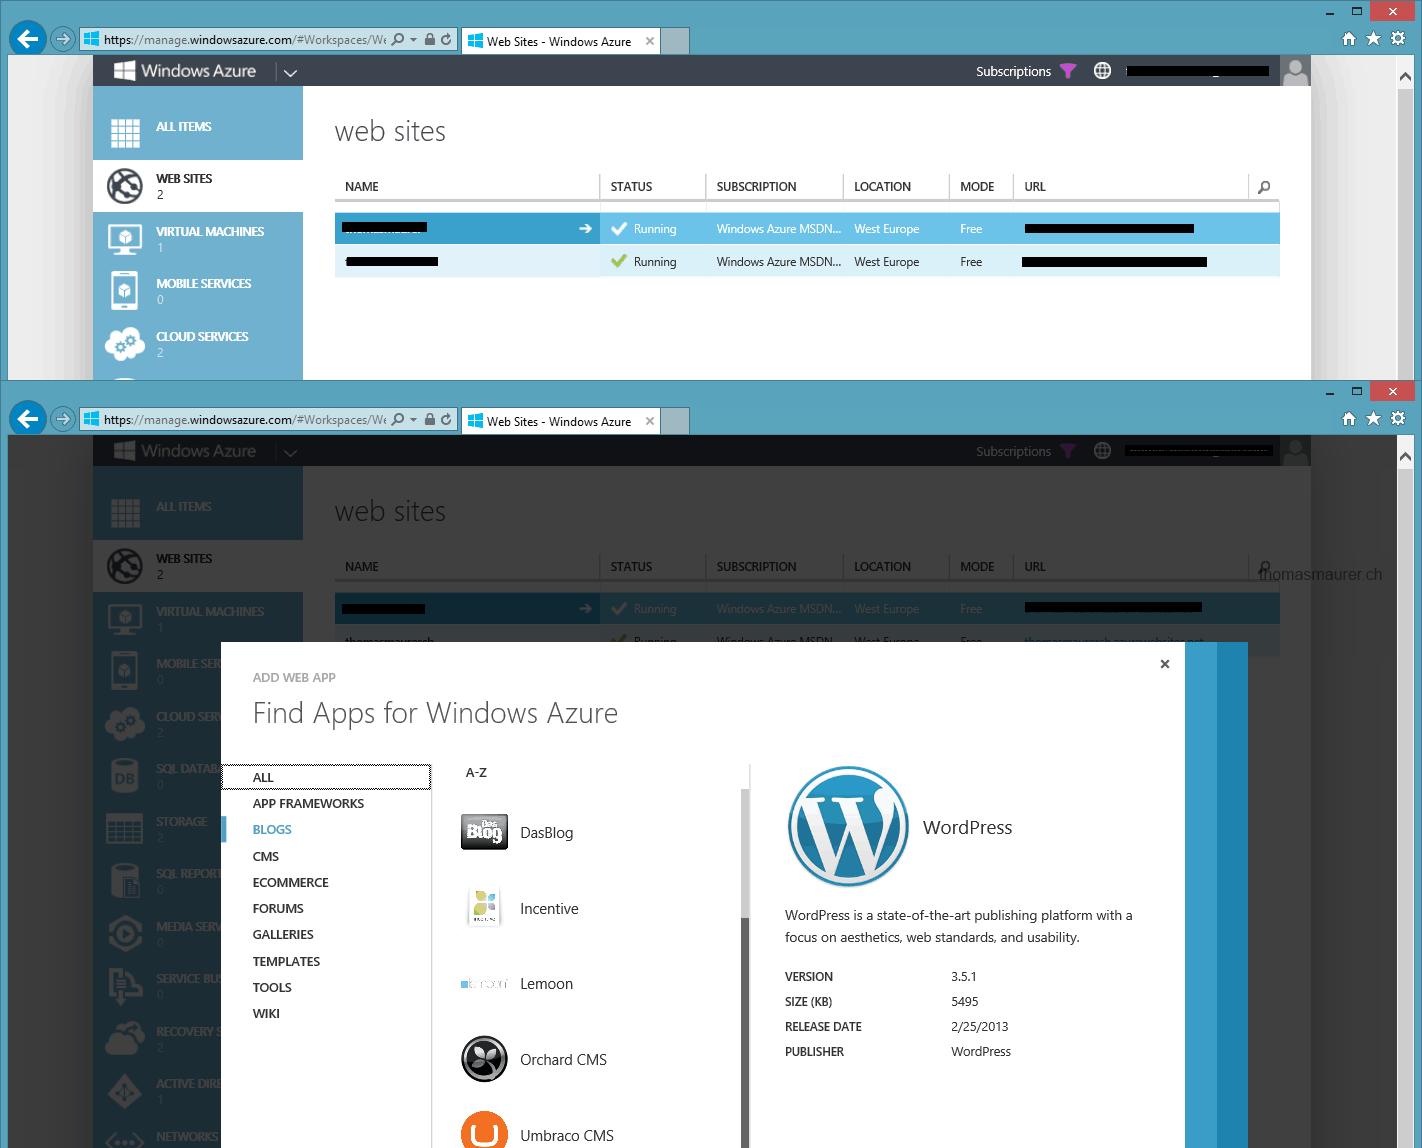 Migrate your Wordpress Blog to Microsoft Azure Web Apps - Thomas Maurer